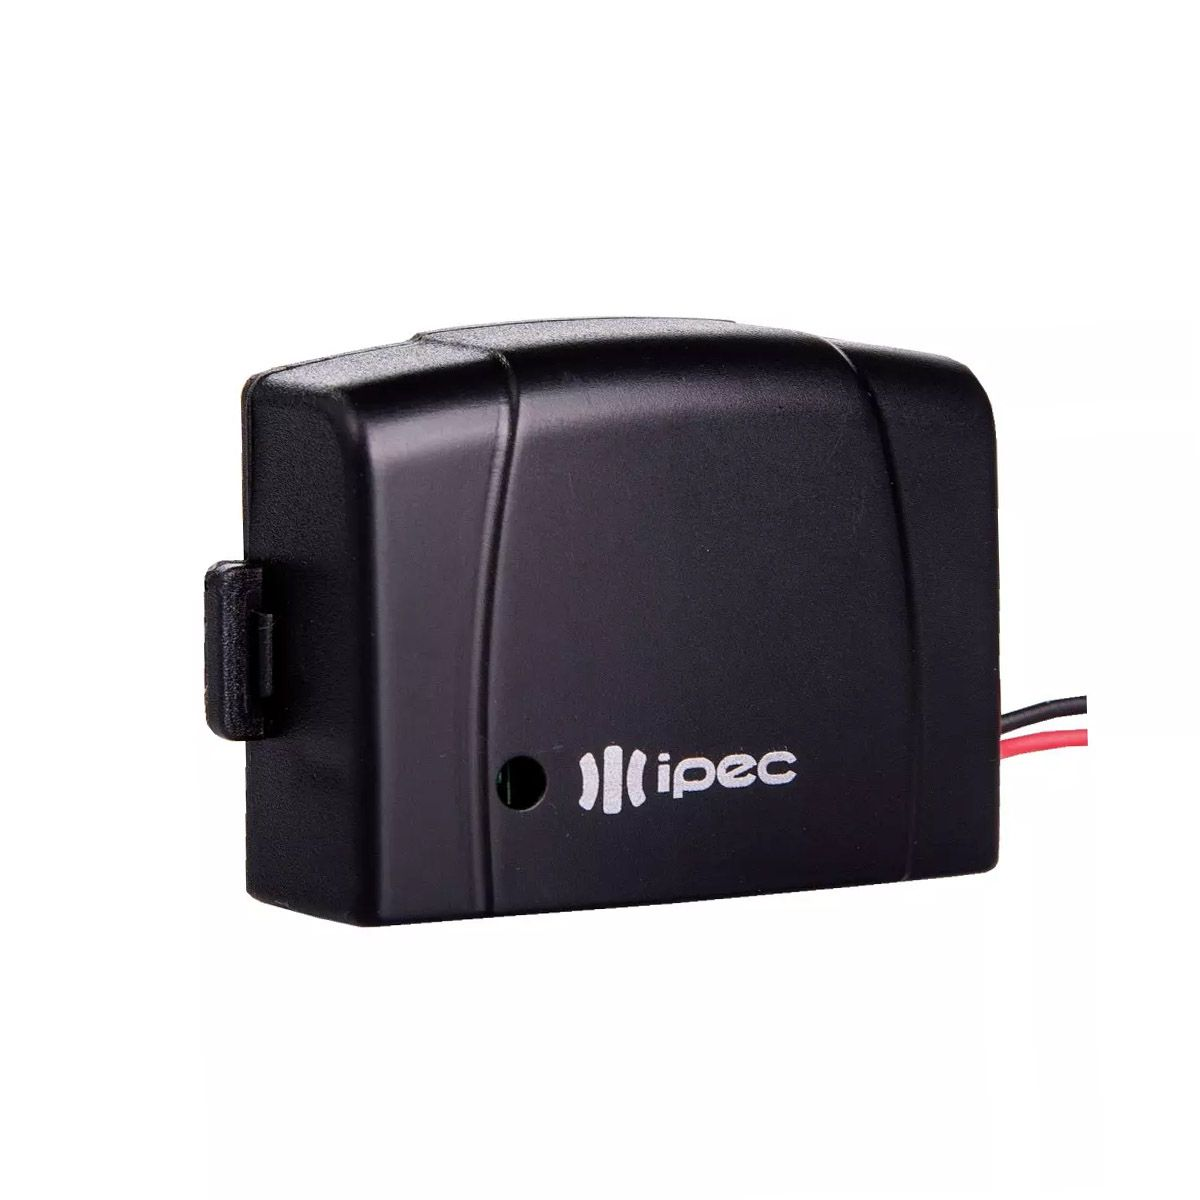 4pcs Controle Veicular Ppa Garen Motor Portao Farol Saw